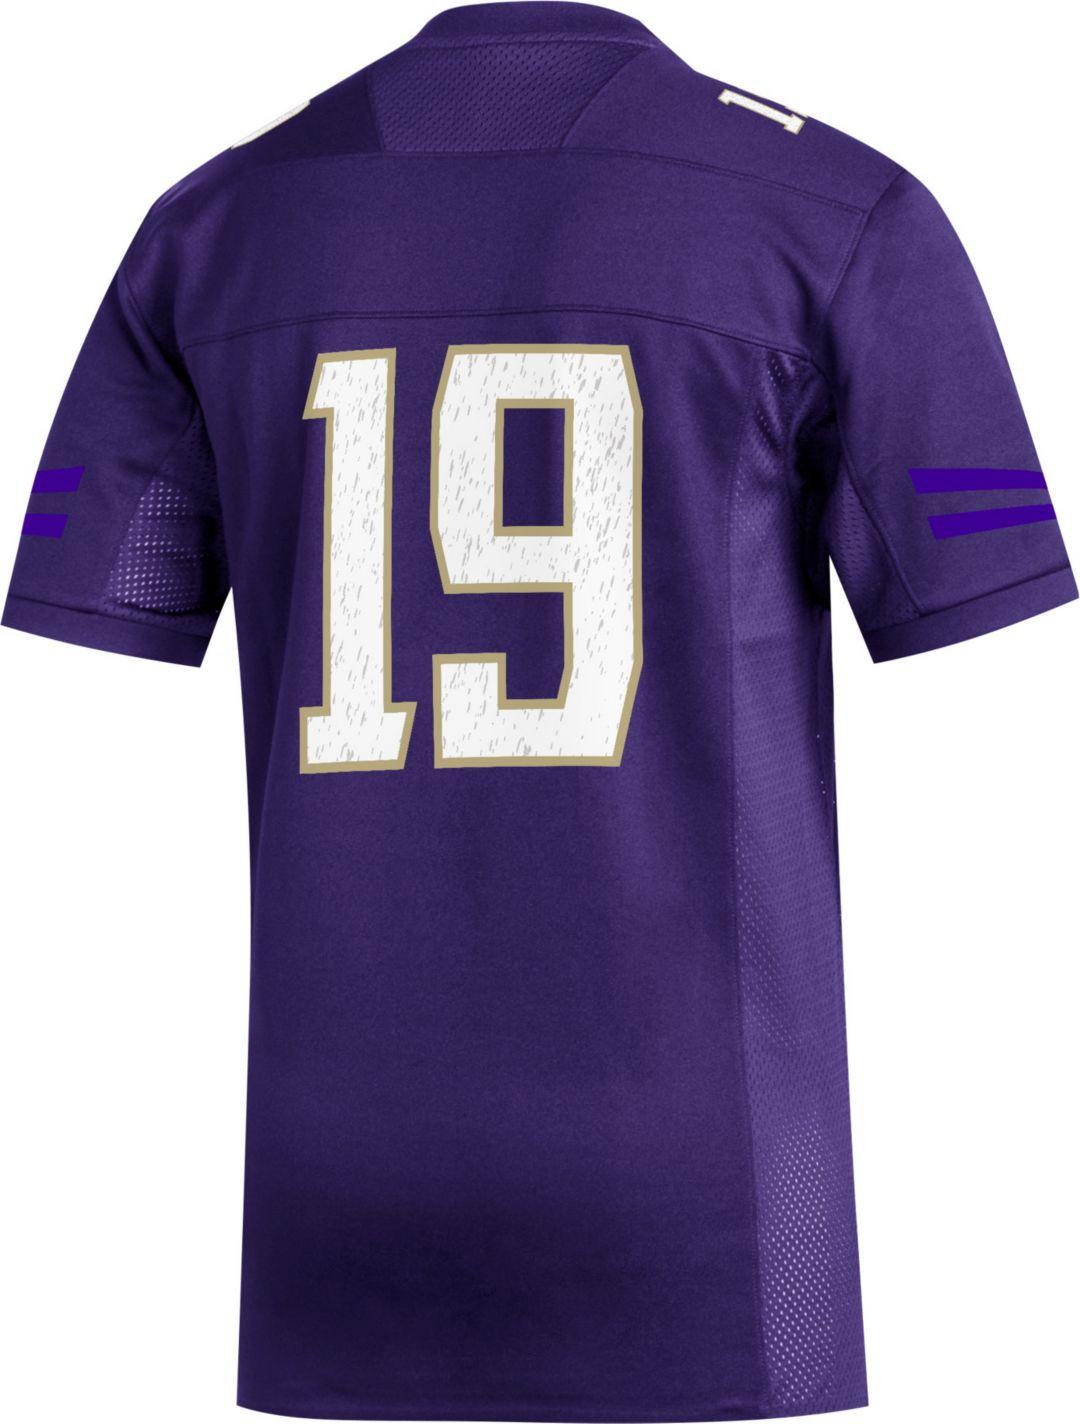 new arrivals 37248 75160 adidas Men's Washington Huskies #19 Purple Replica Football Jersey